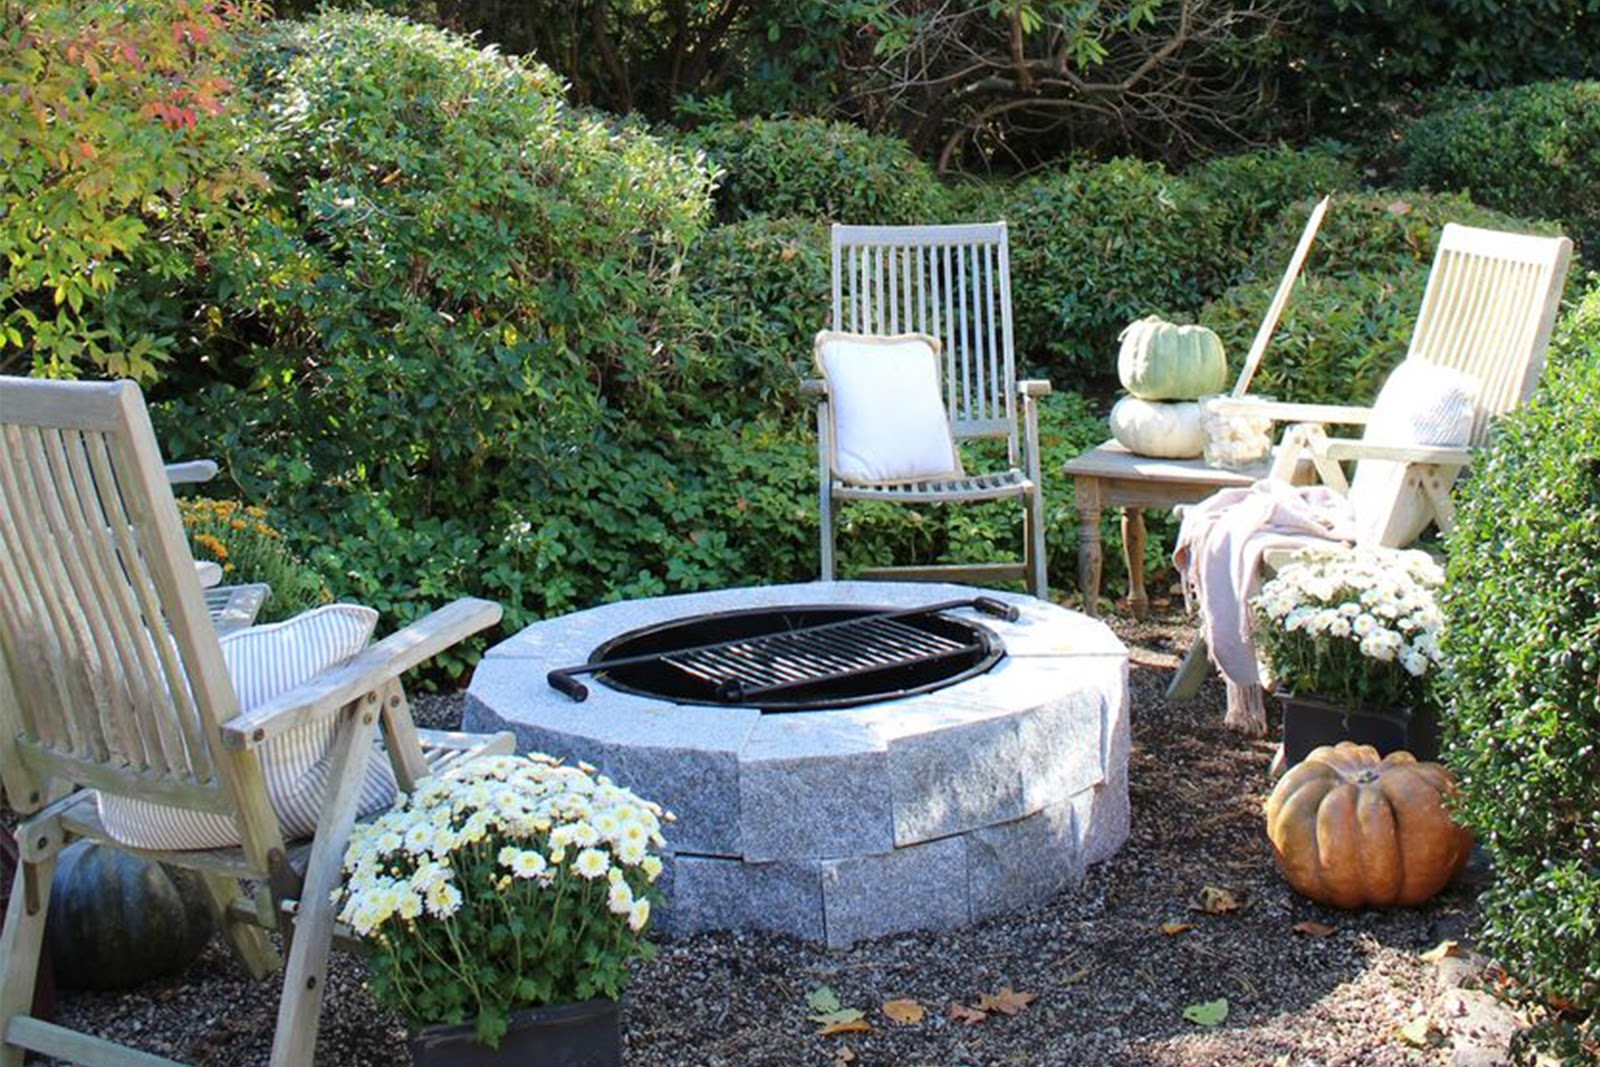 Woodbury Gray granite DIY fire pit in autumn